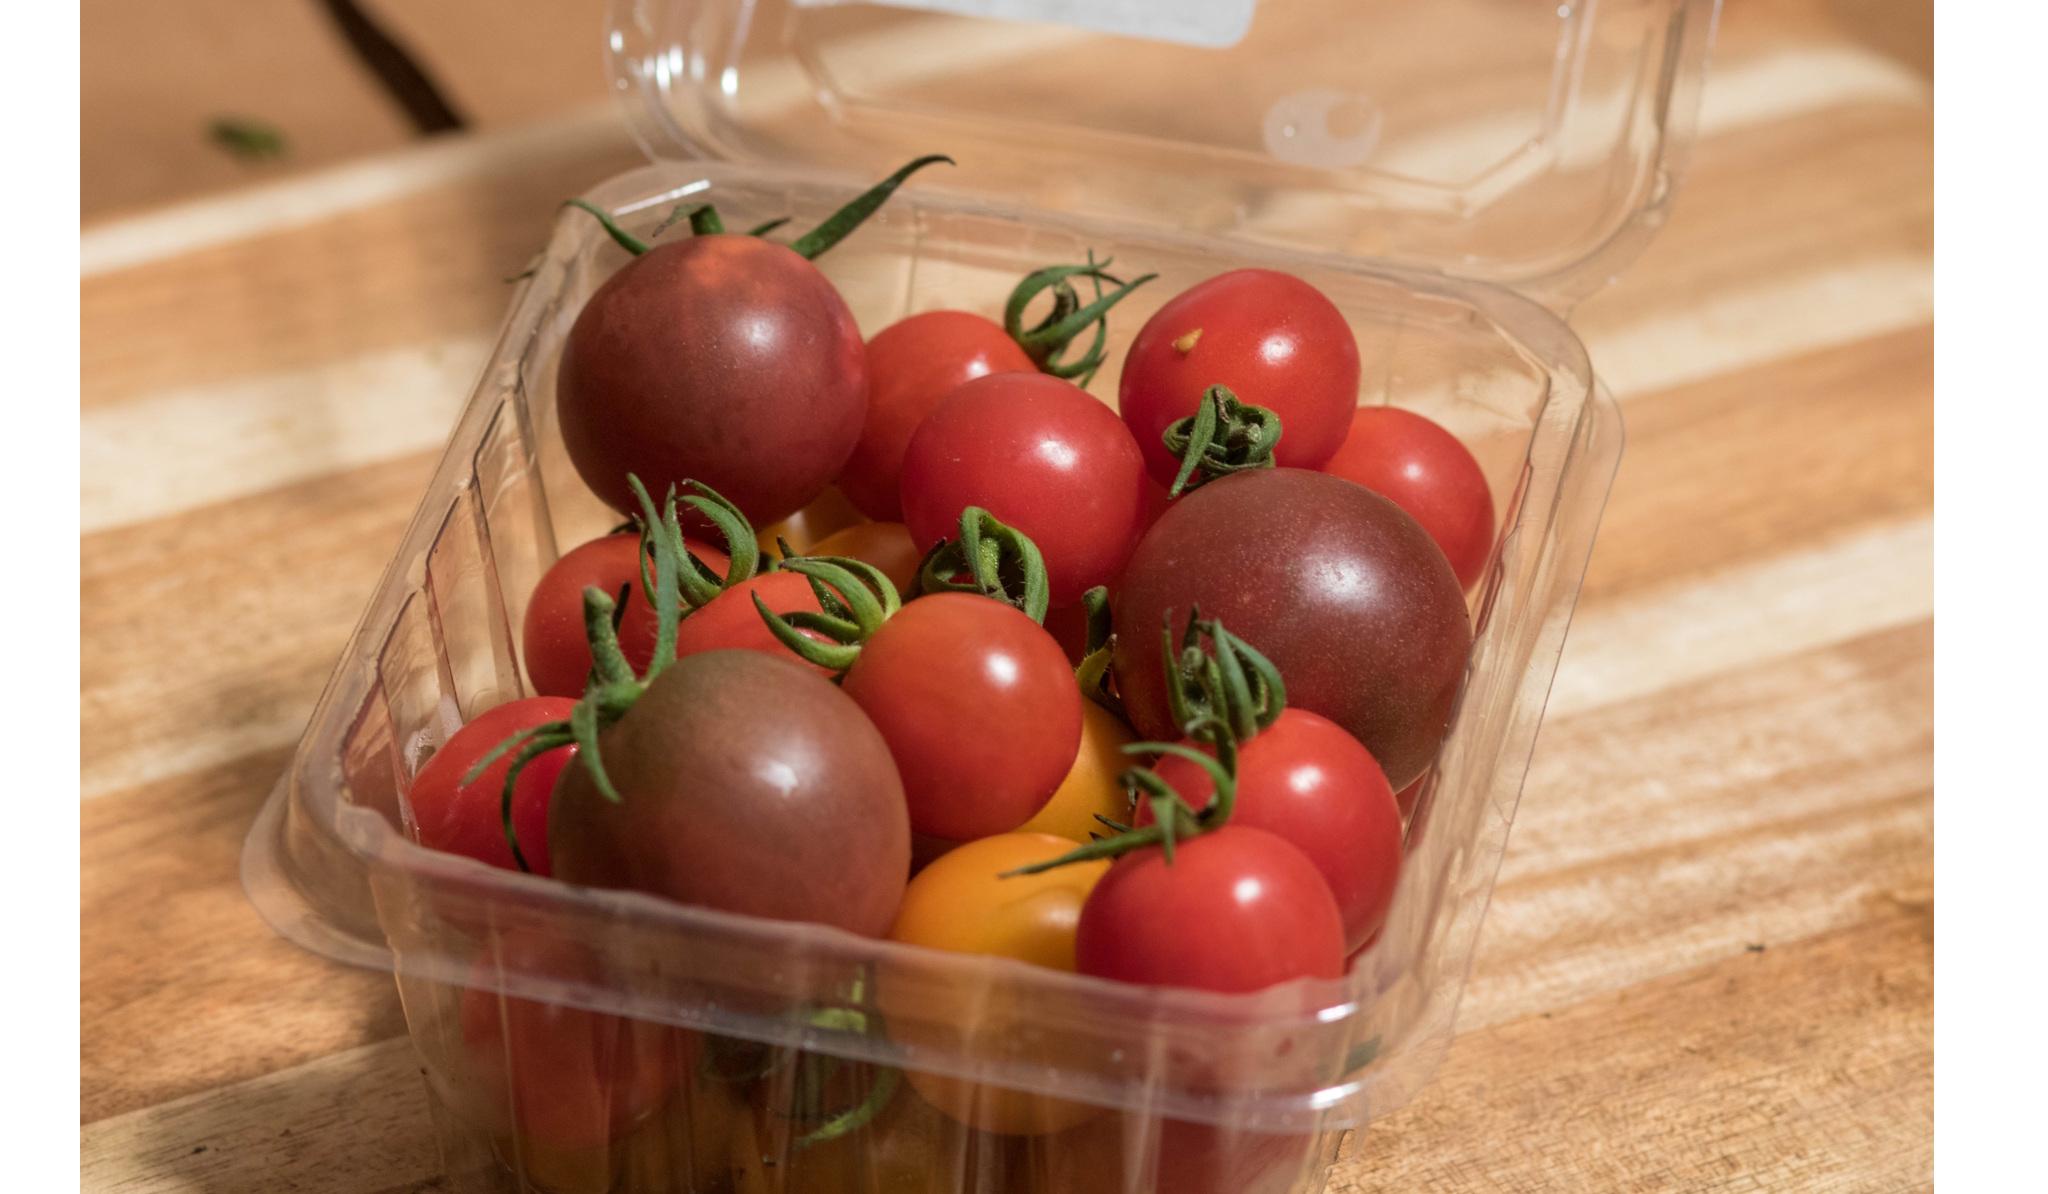 DogwoodFarms - 102809 - Tomato - Cherry - Heirloom - Mixed - Organic - 7.24.18 - P1 (1).jpg